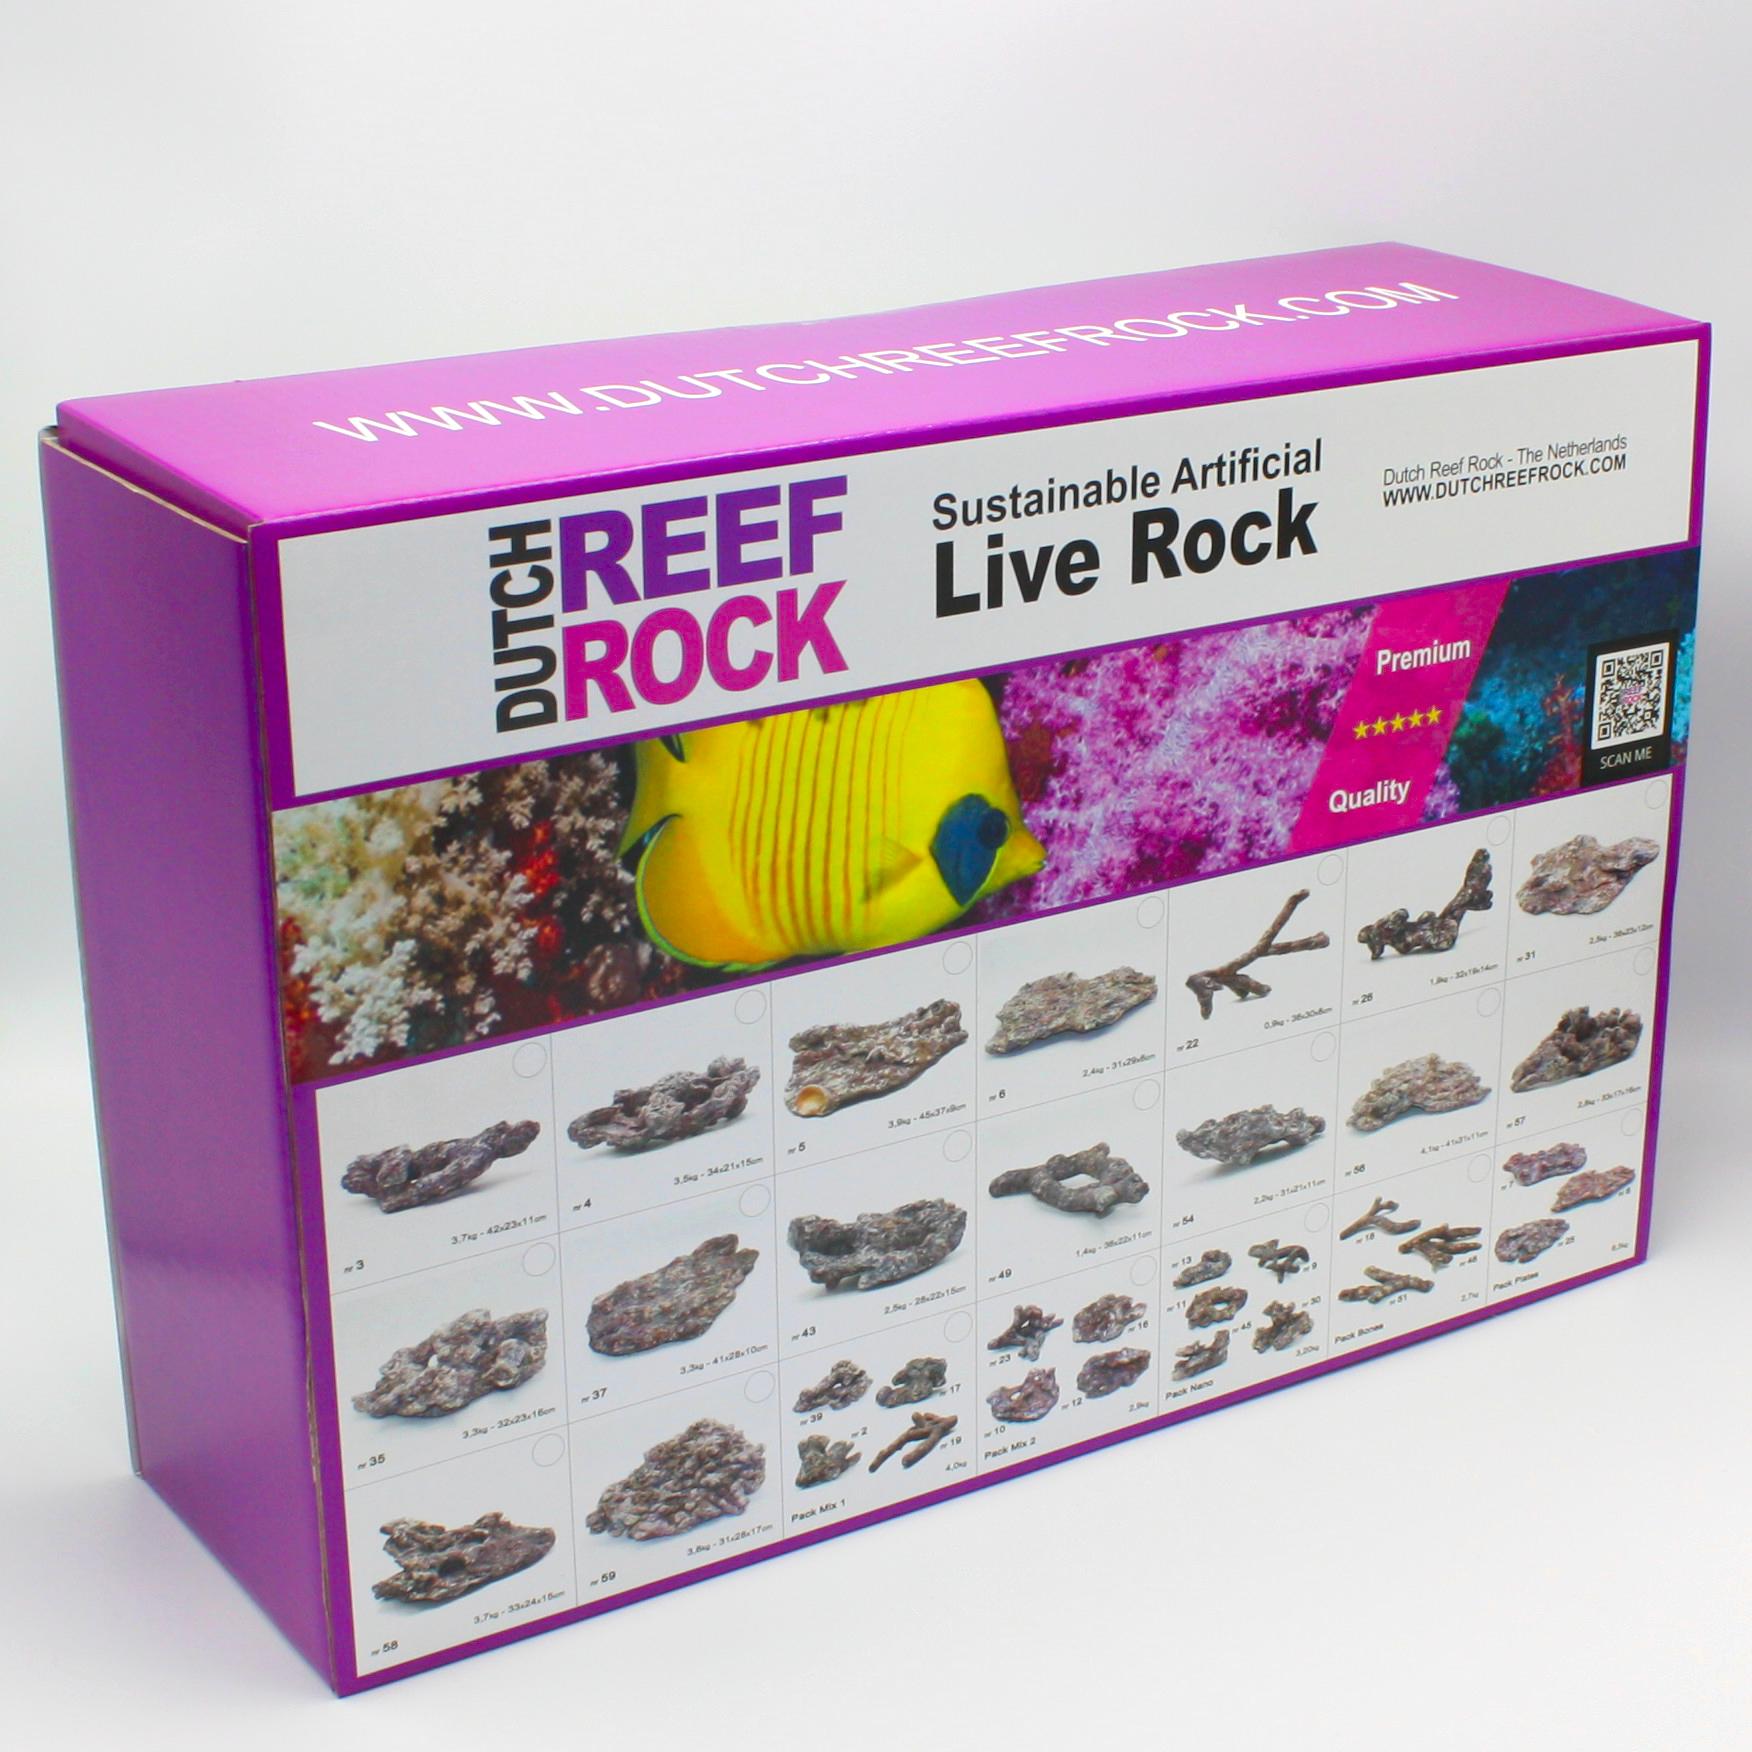 dutch reef rock big box